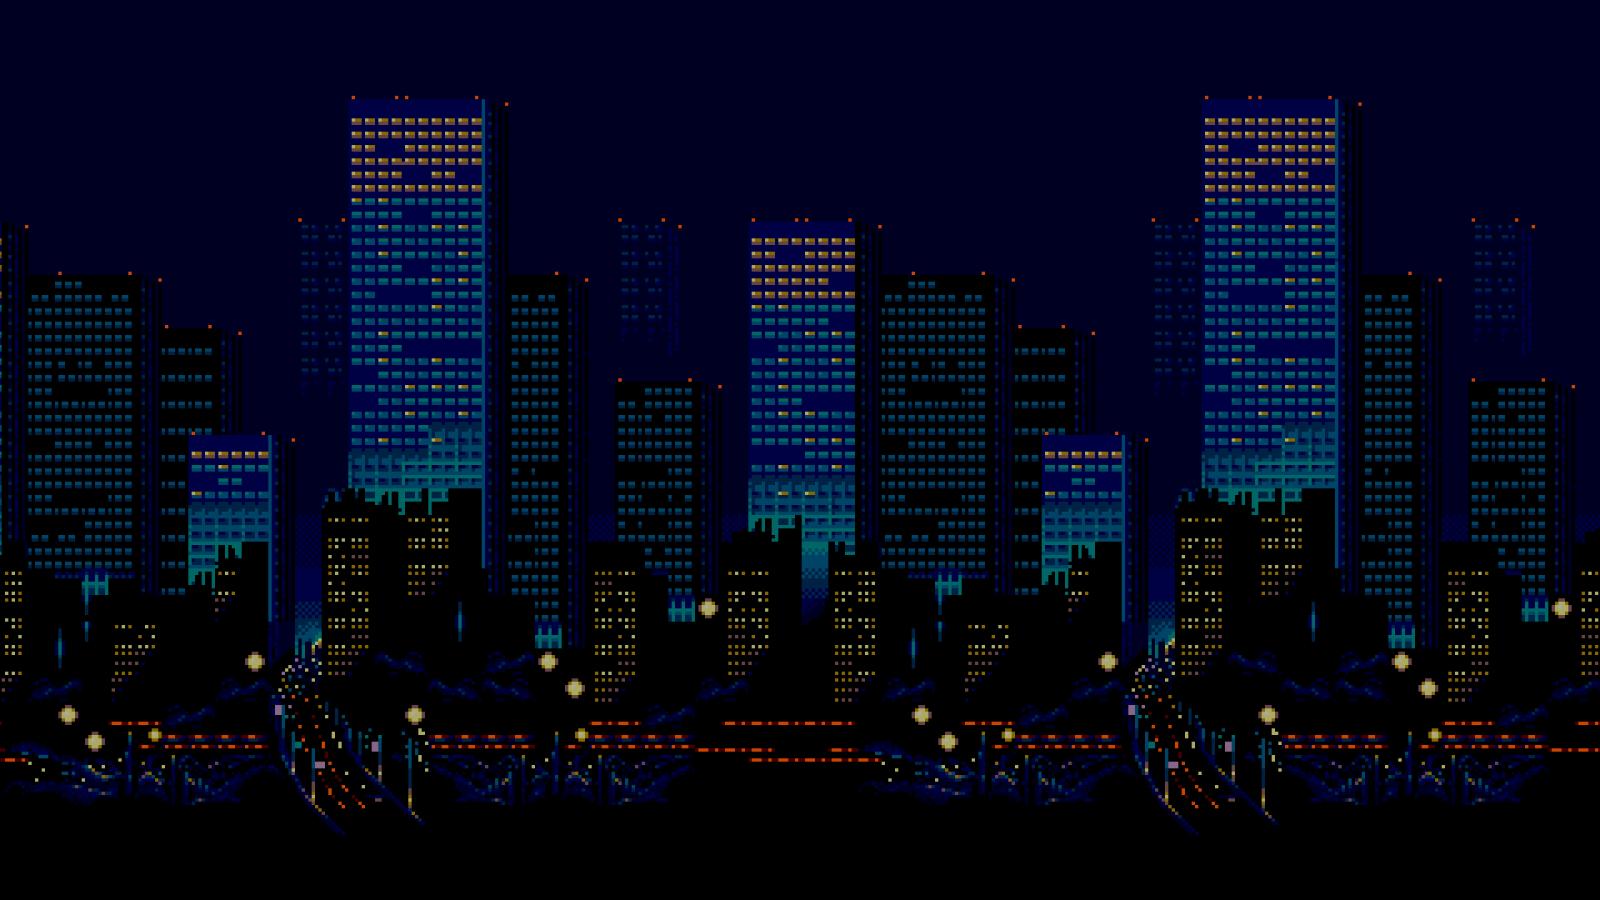 fond d 39 cran paysage urbain nuit pixel art urbain horizon gratte ciel 16 bits horizon. Black Bedroom Furniture Sets. Home Design Ideas